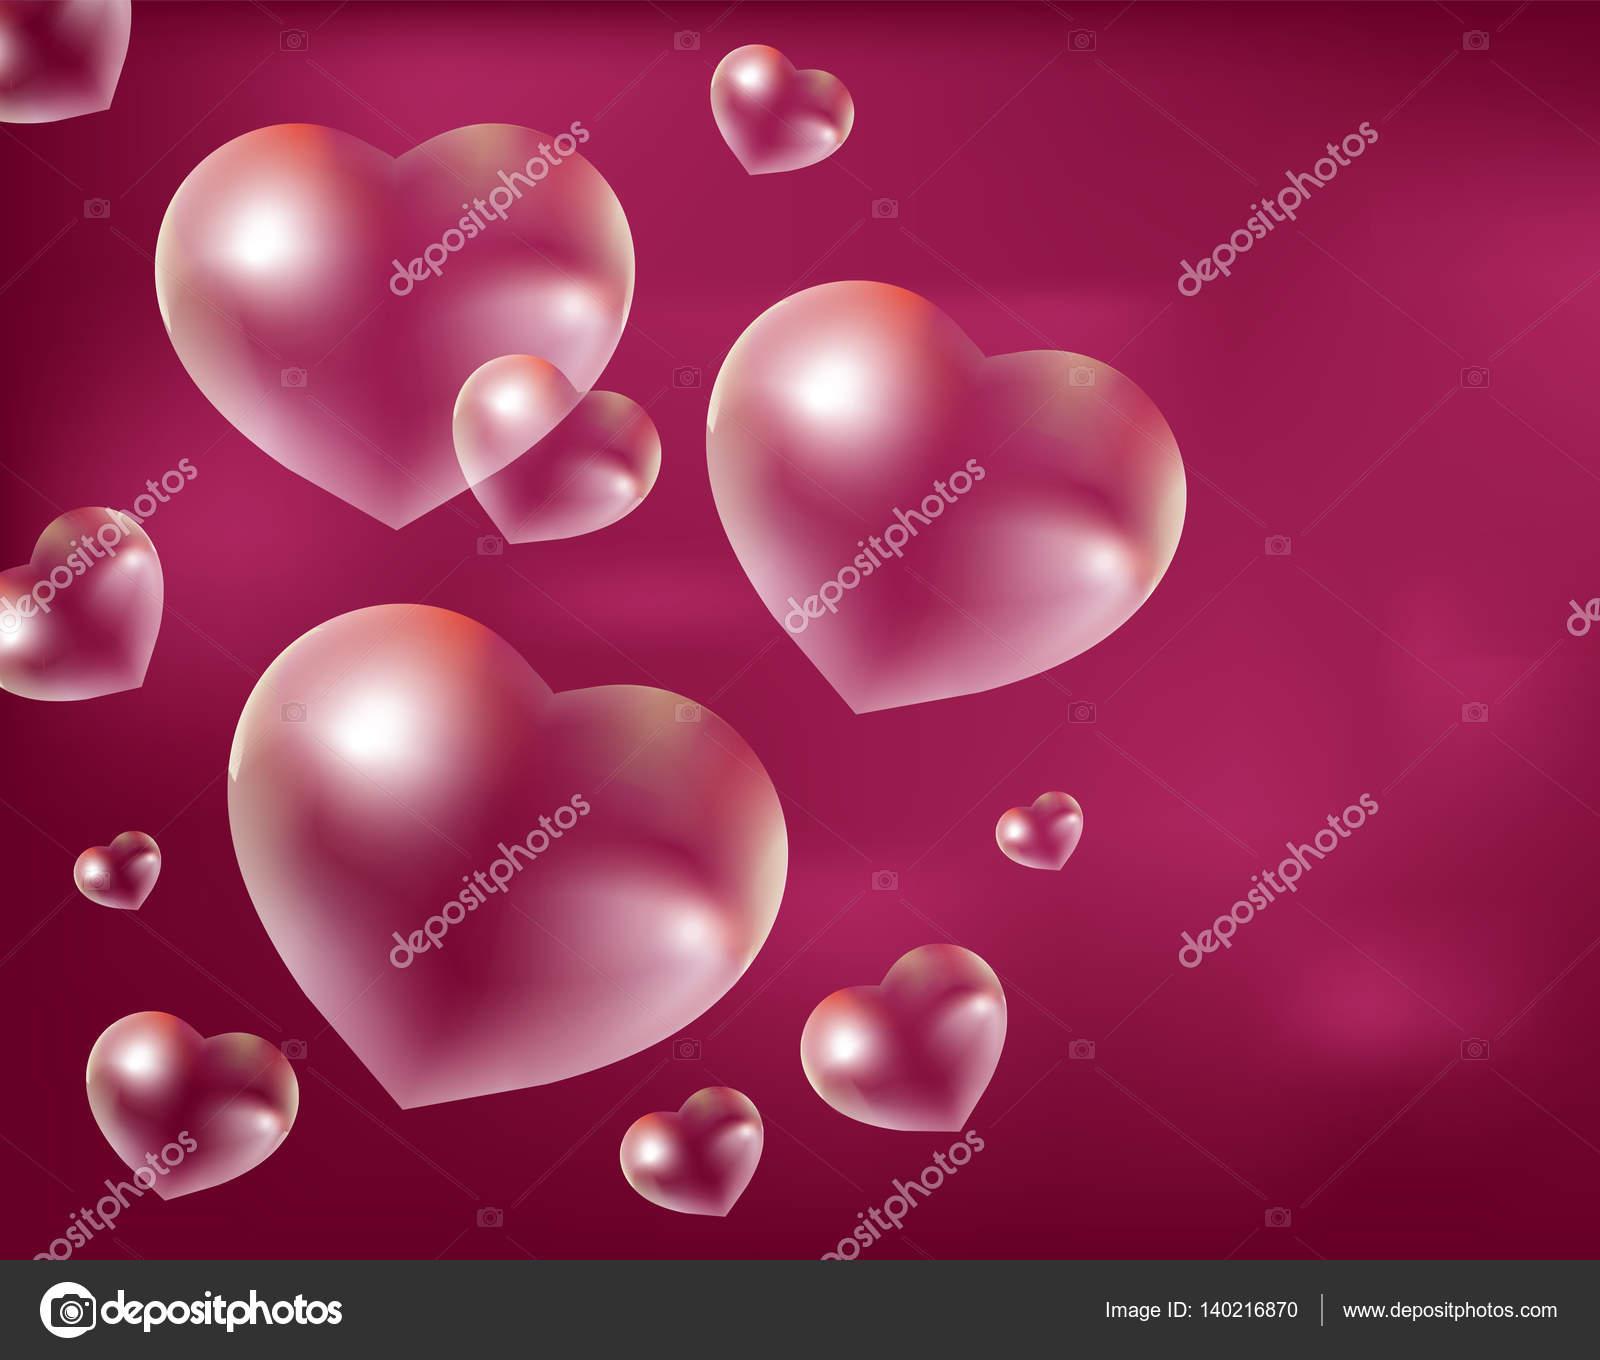 Realistic soap bubbles Heart-shaped. Drops of water in a shape ...